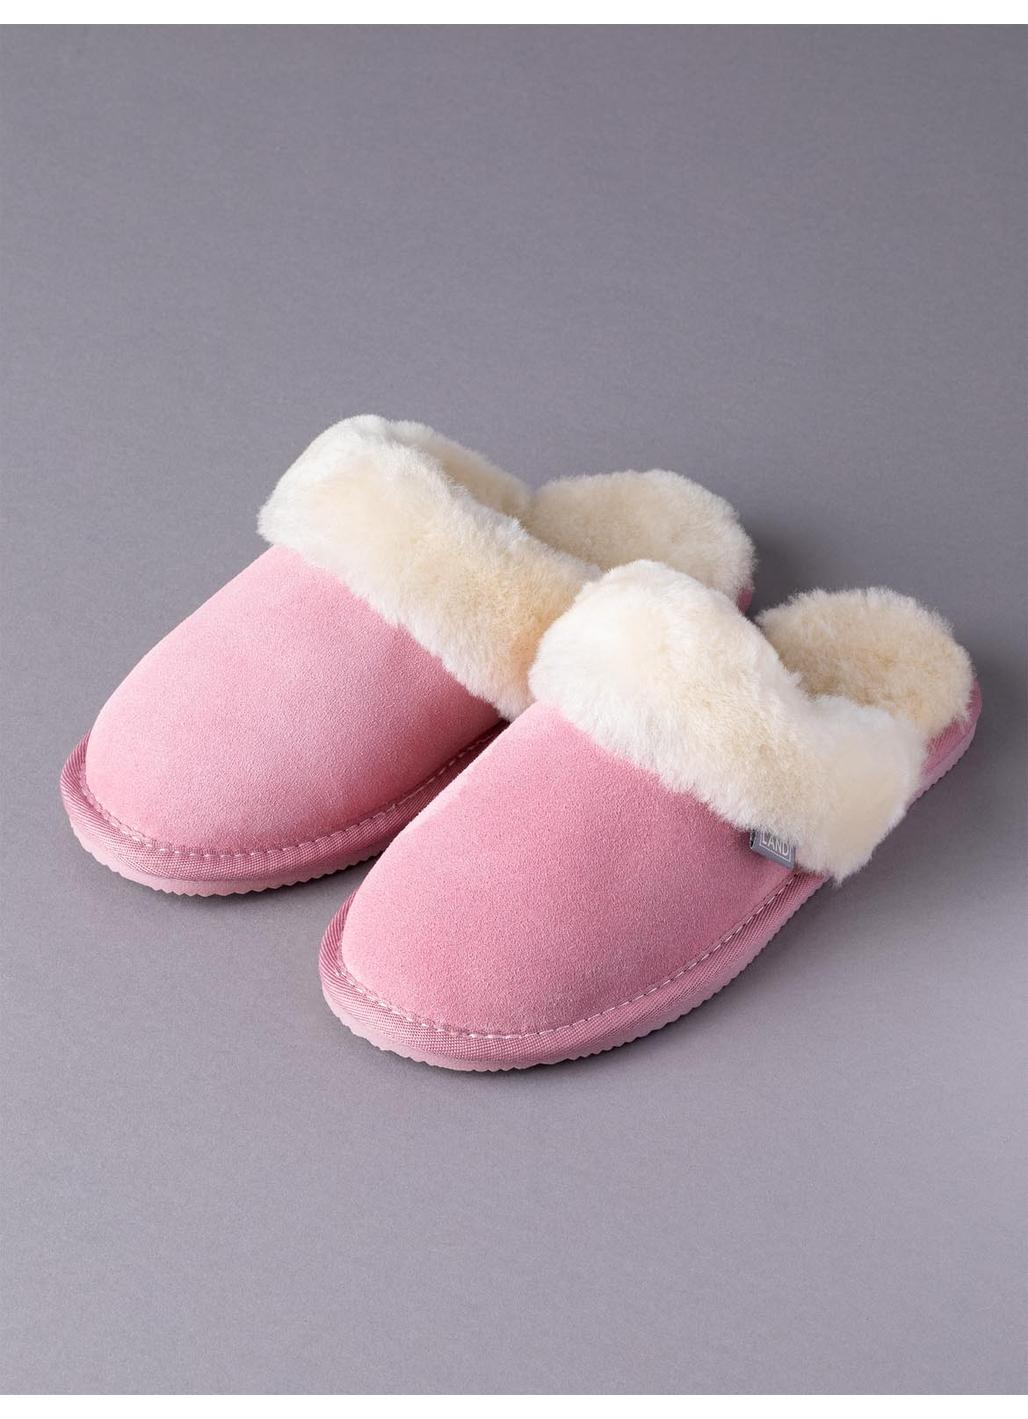 Ladies' Sheepskin Slider Slippers in Pink